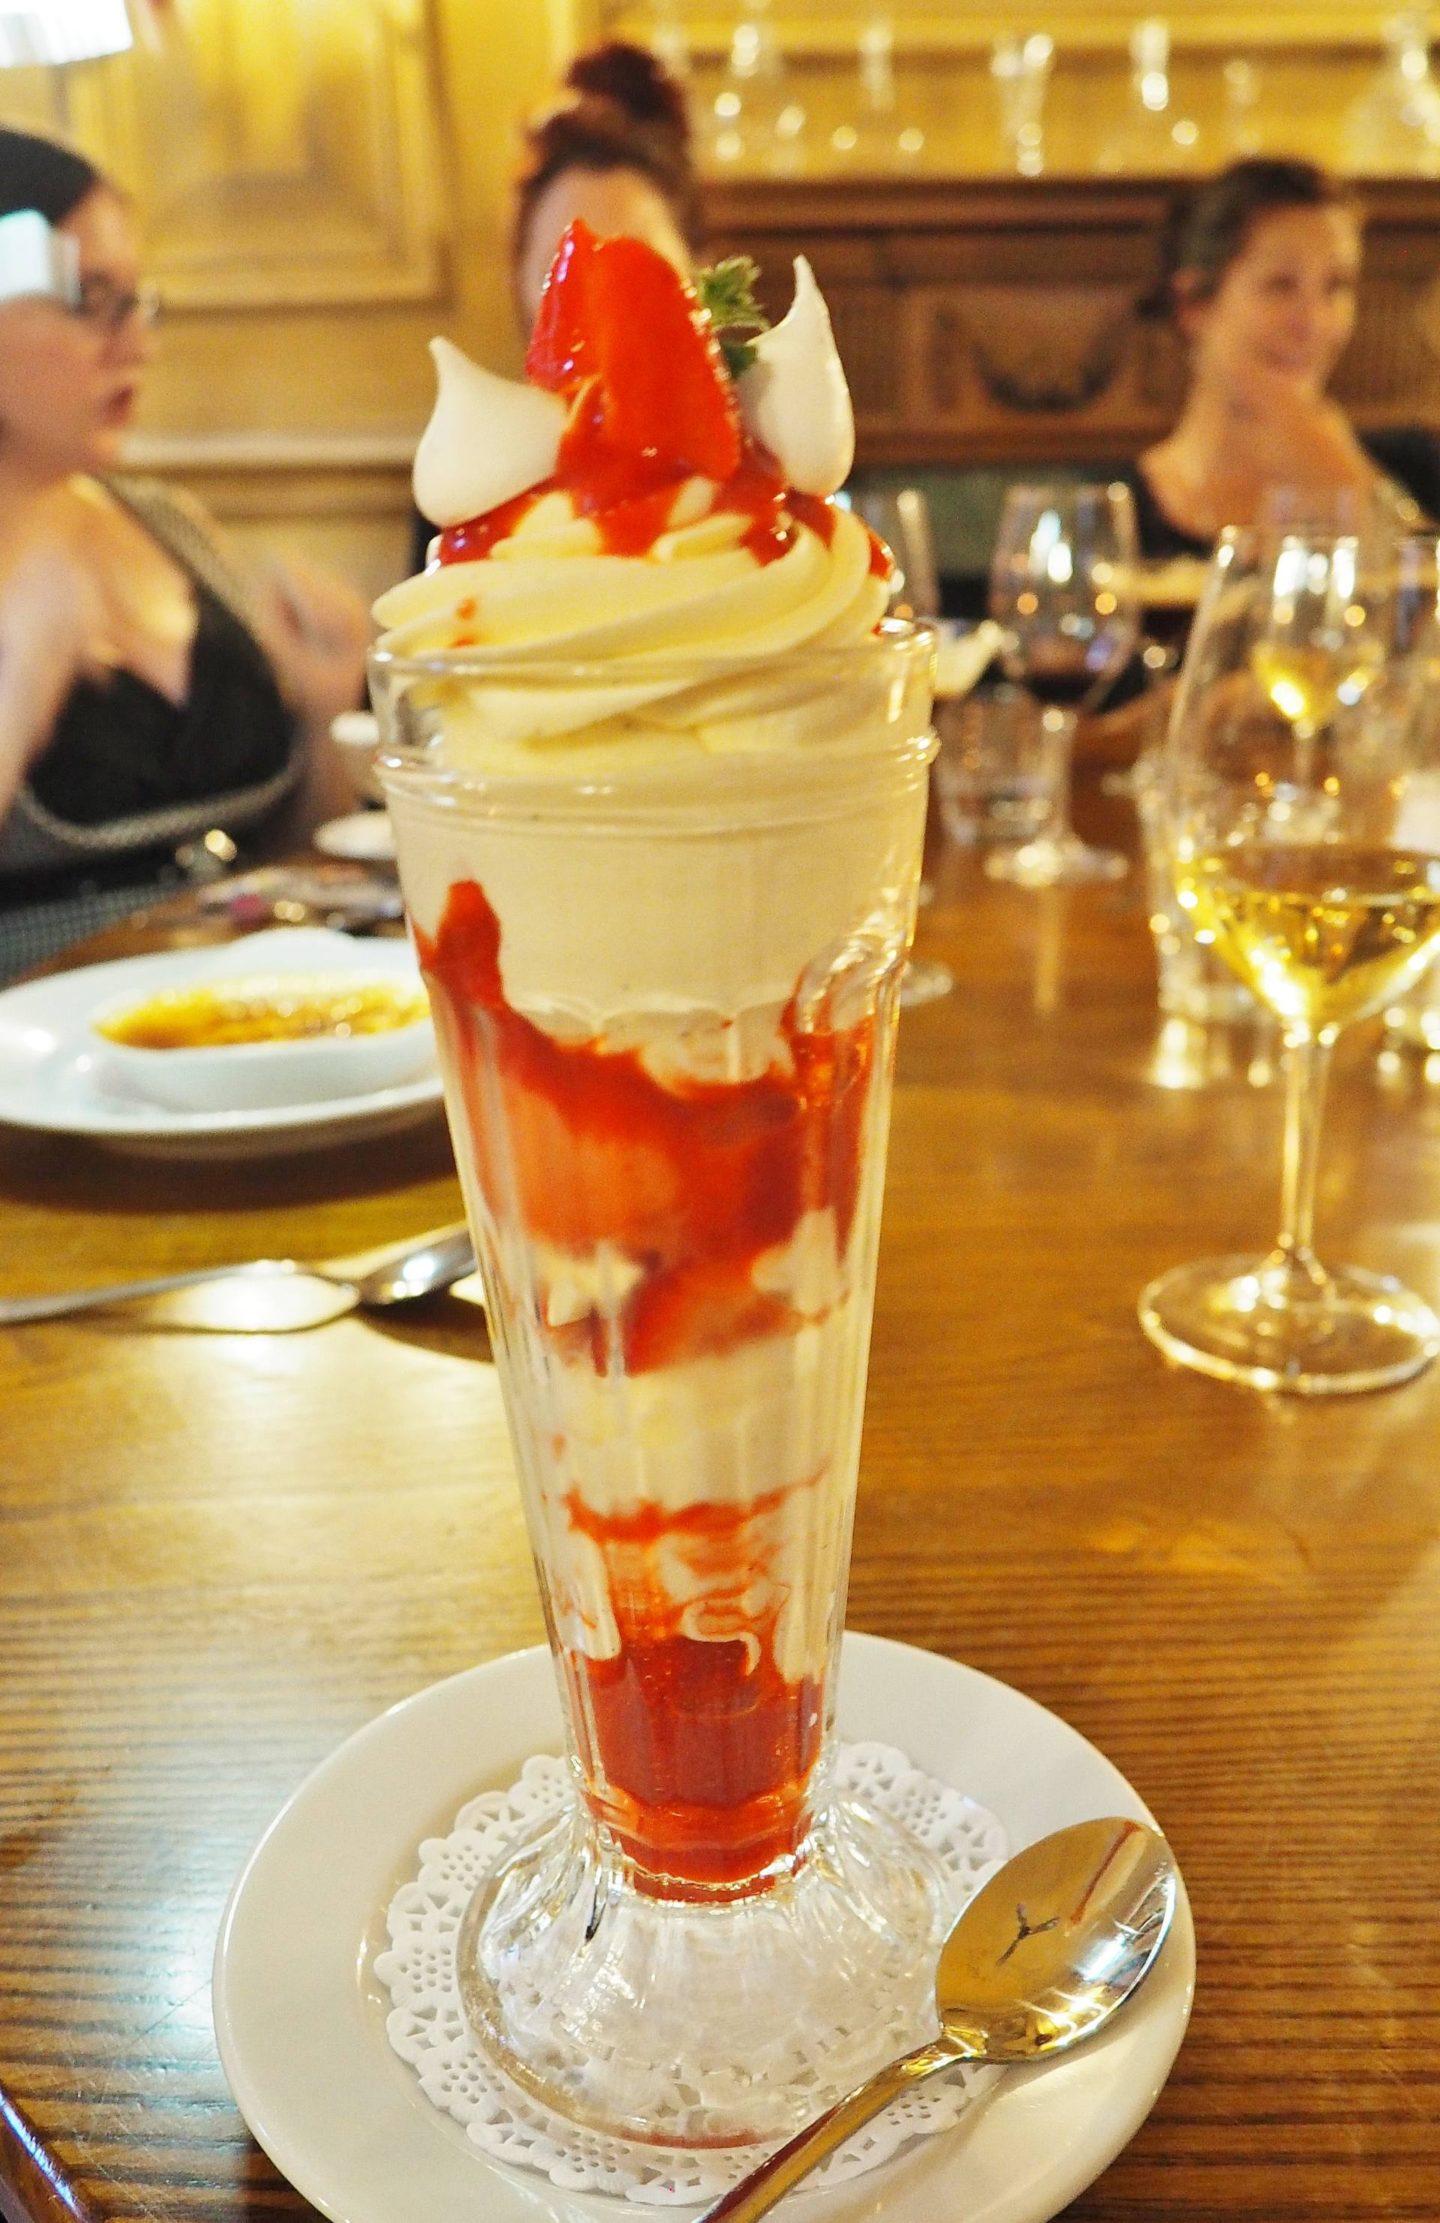 STRAWBERRY VACHERIN SUNDAE £6.50 Scottish strawberries, vanilla ice cream, strawberry sorbet garnished with Chantilly cream with crisp meringue